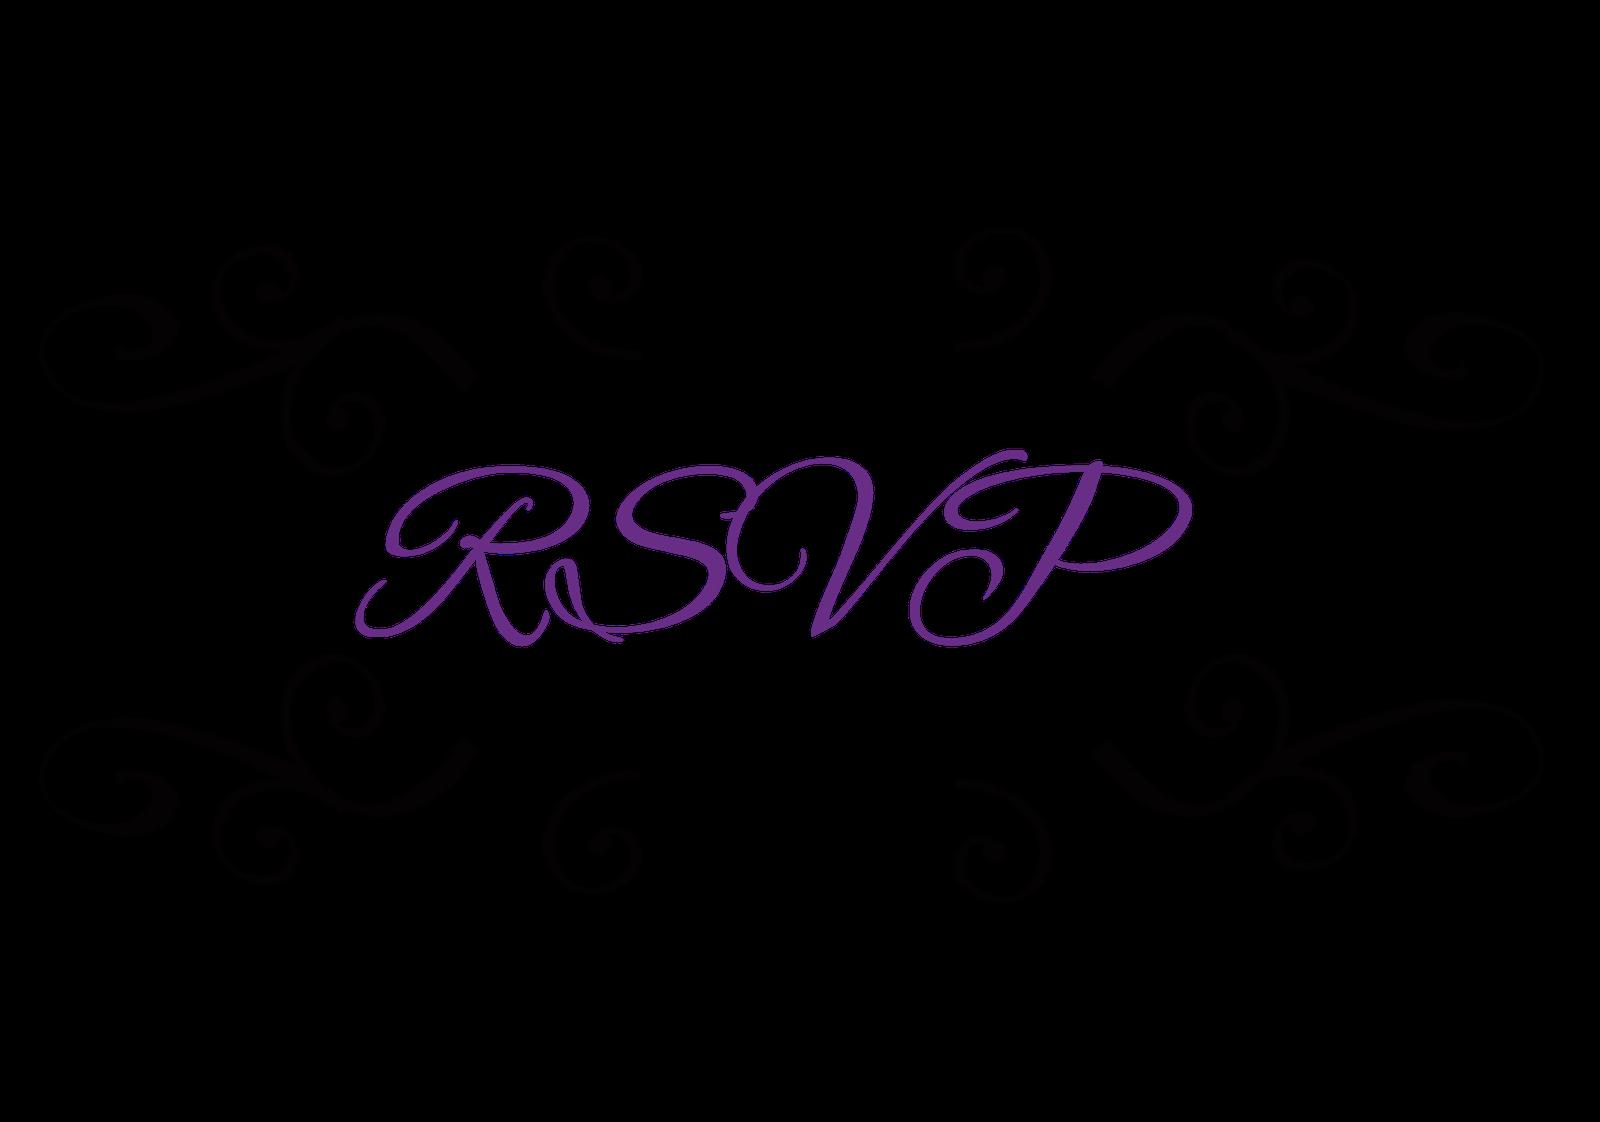 Gallery clipart rsvp Clip art Clip Western wedding